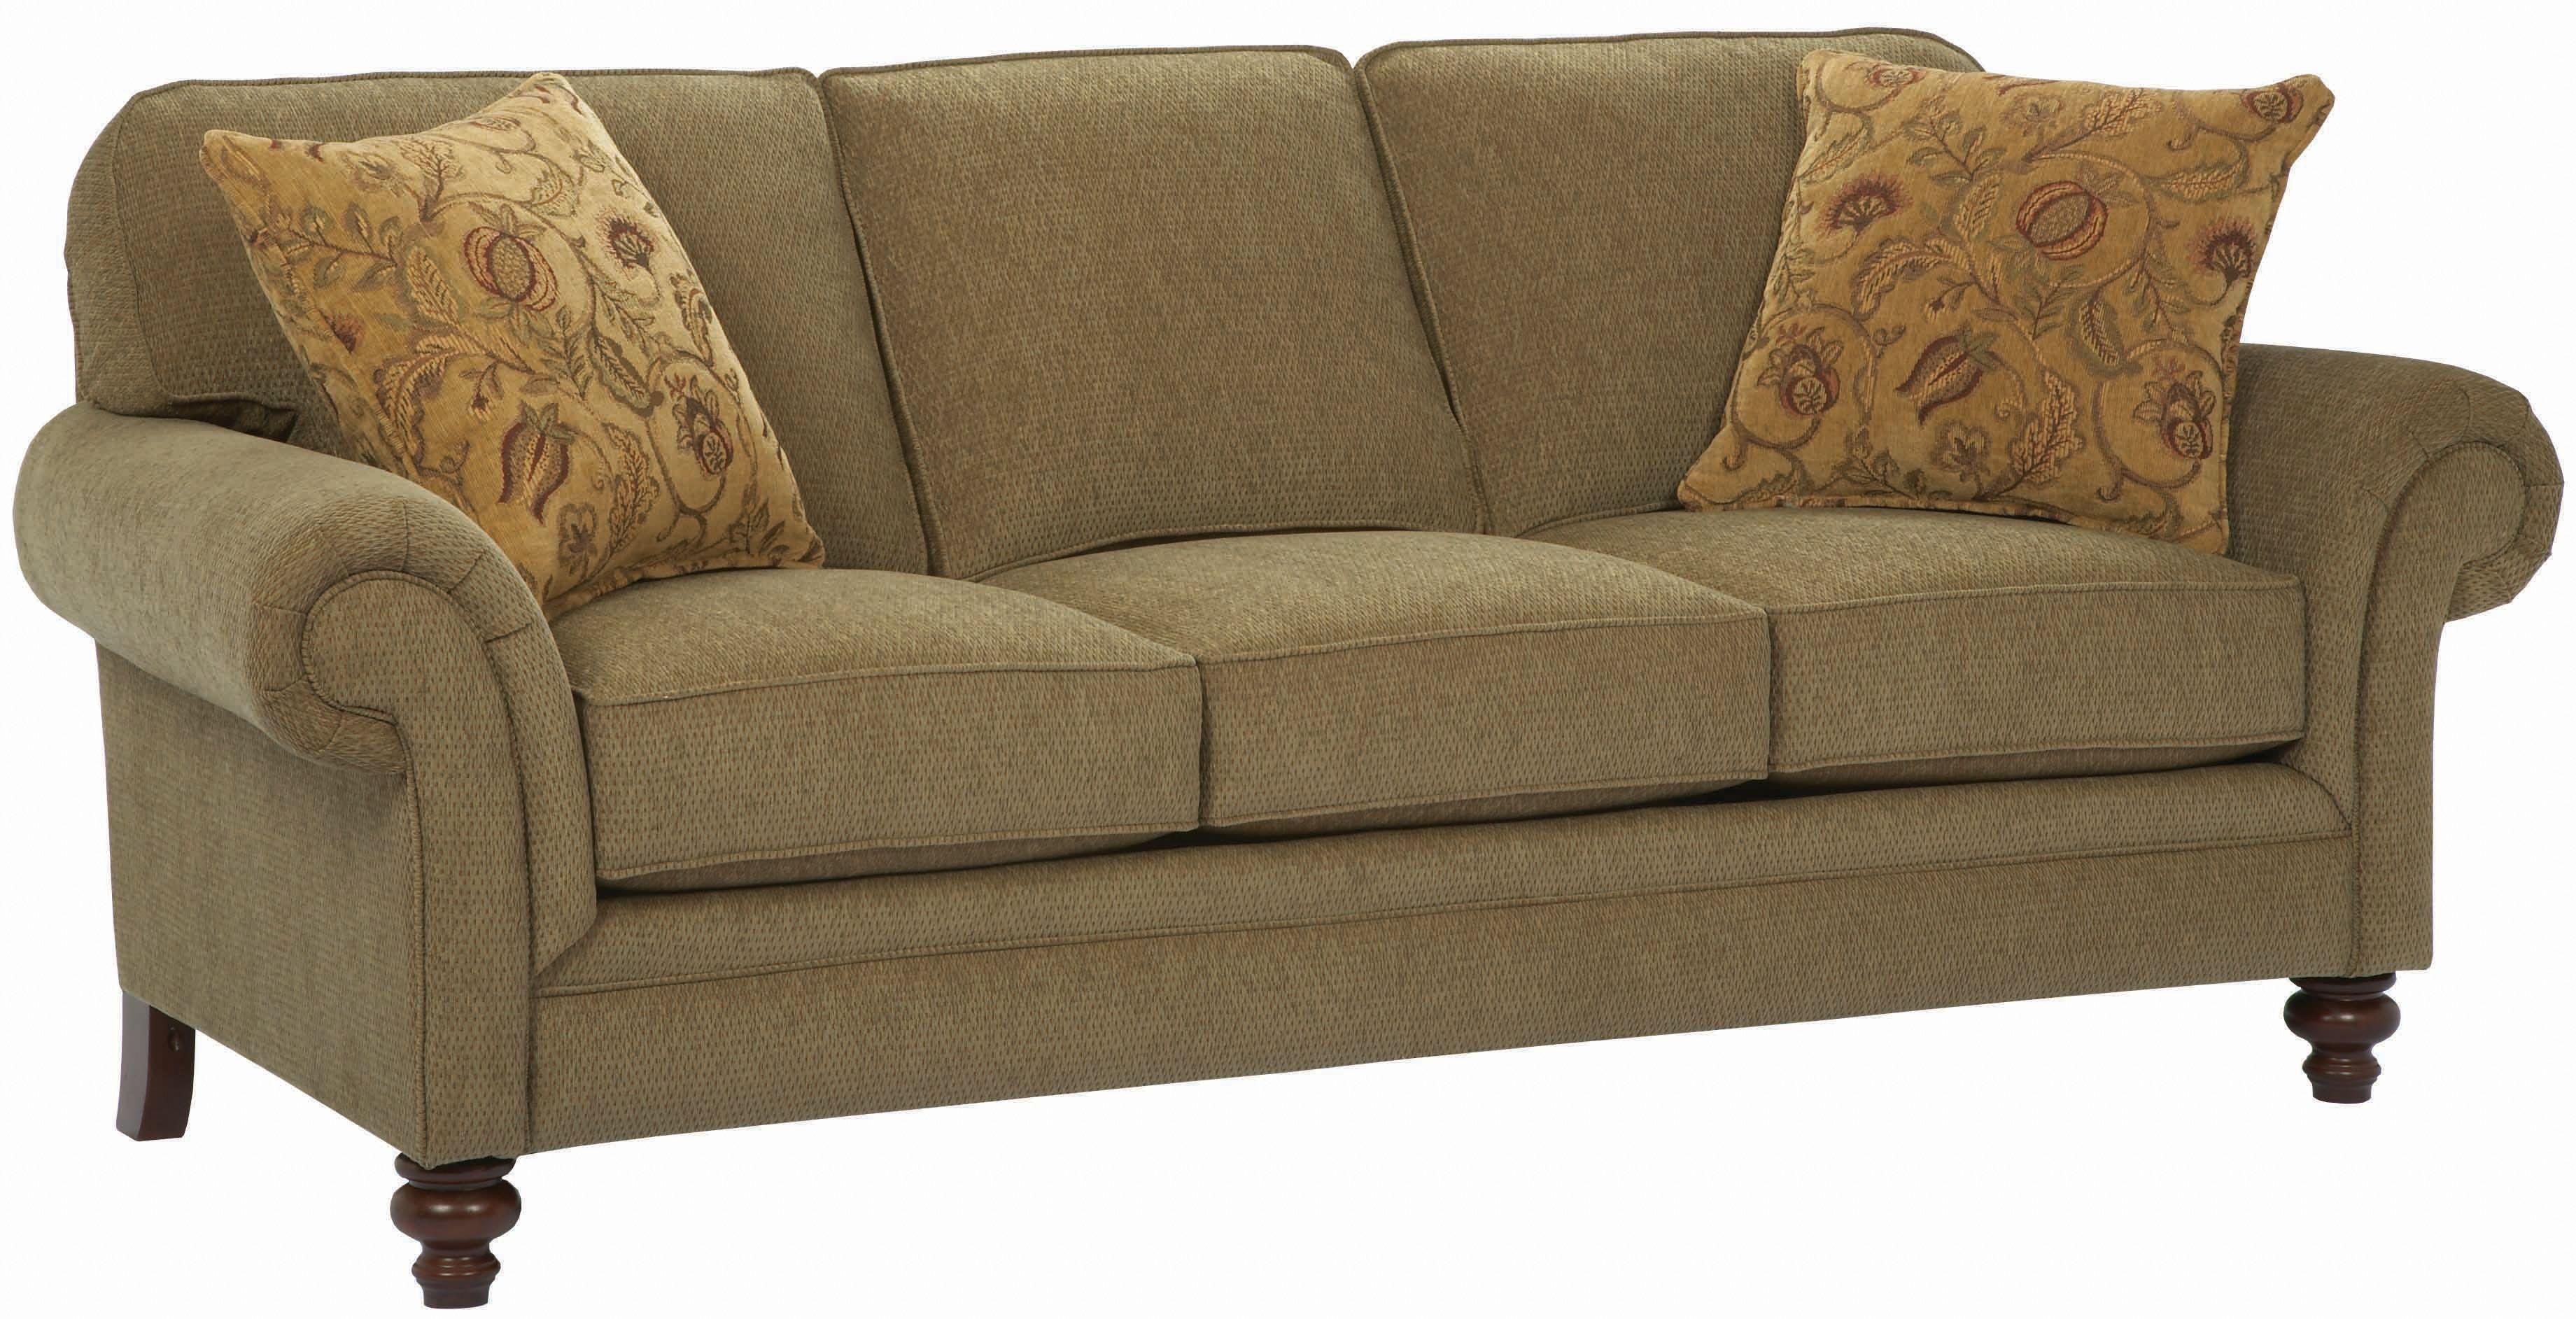 Buy Sofa in Jaipur | SOFAS & CHAIRS | Pinterest